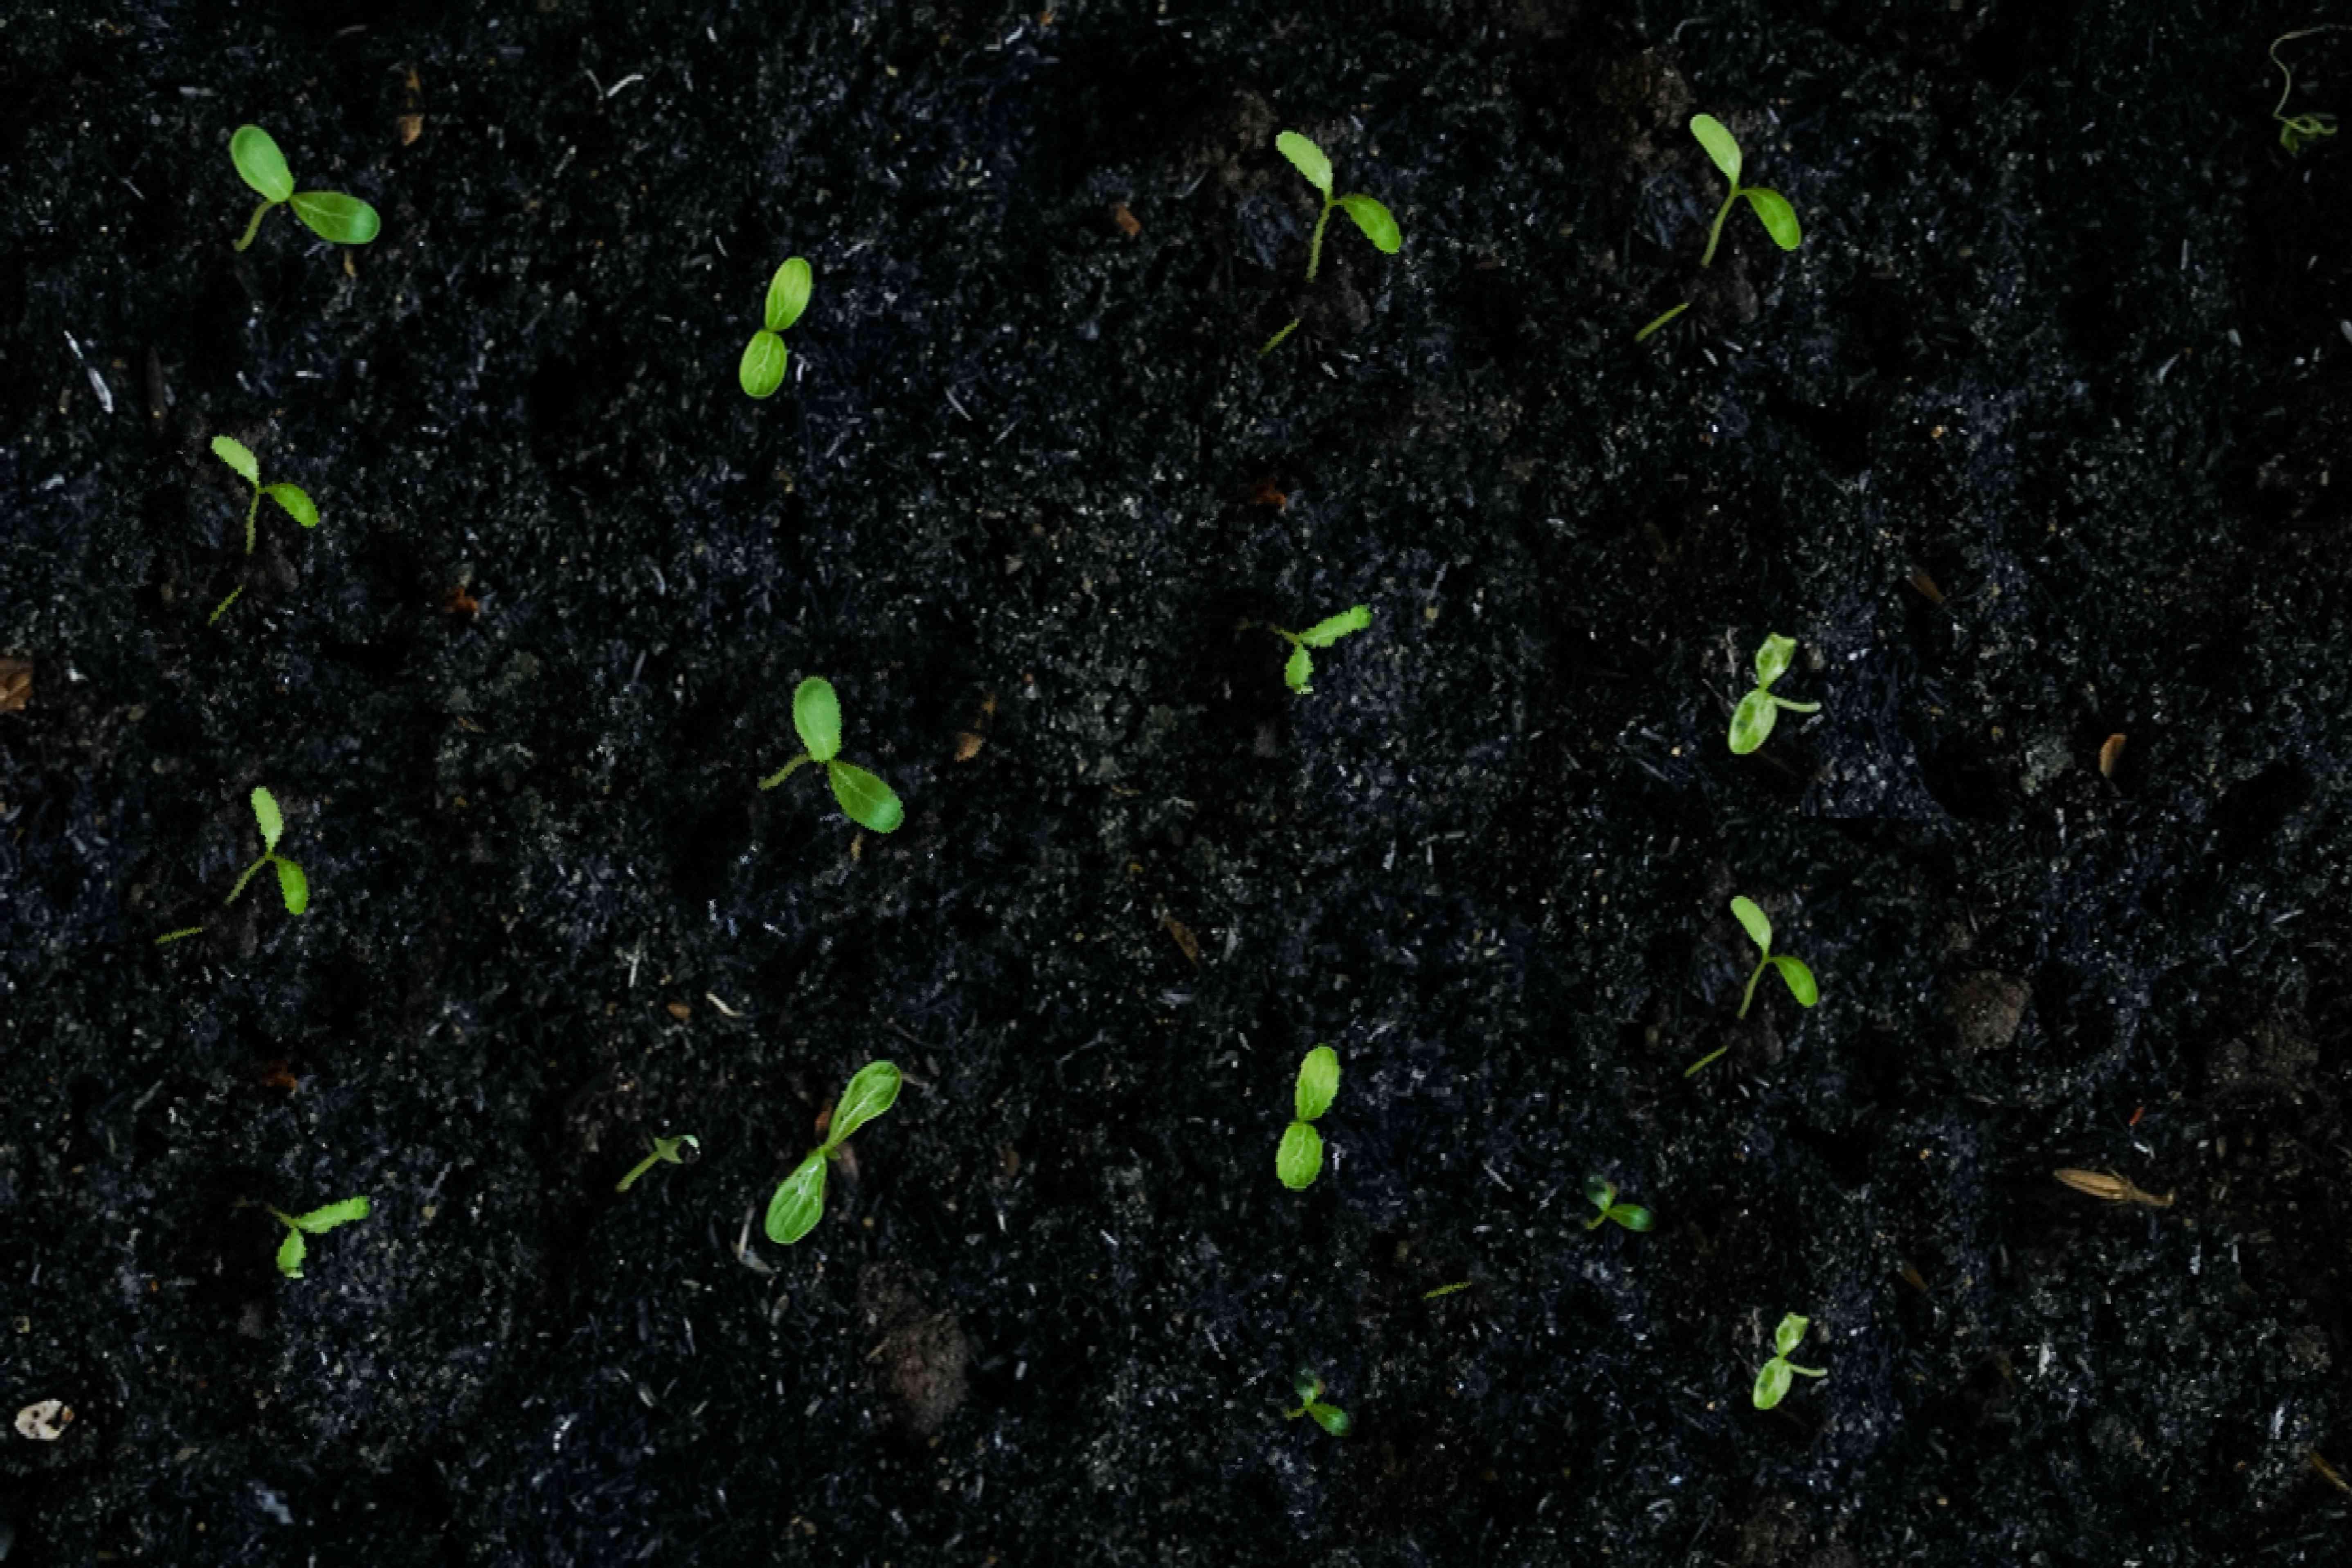 brussels sprouts seedlings